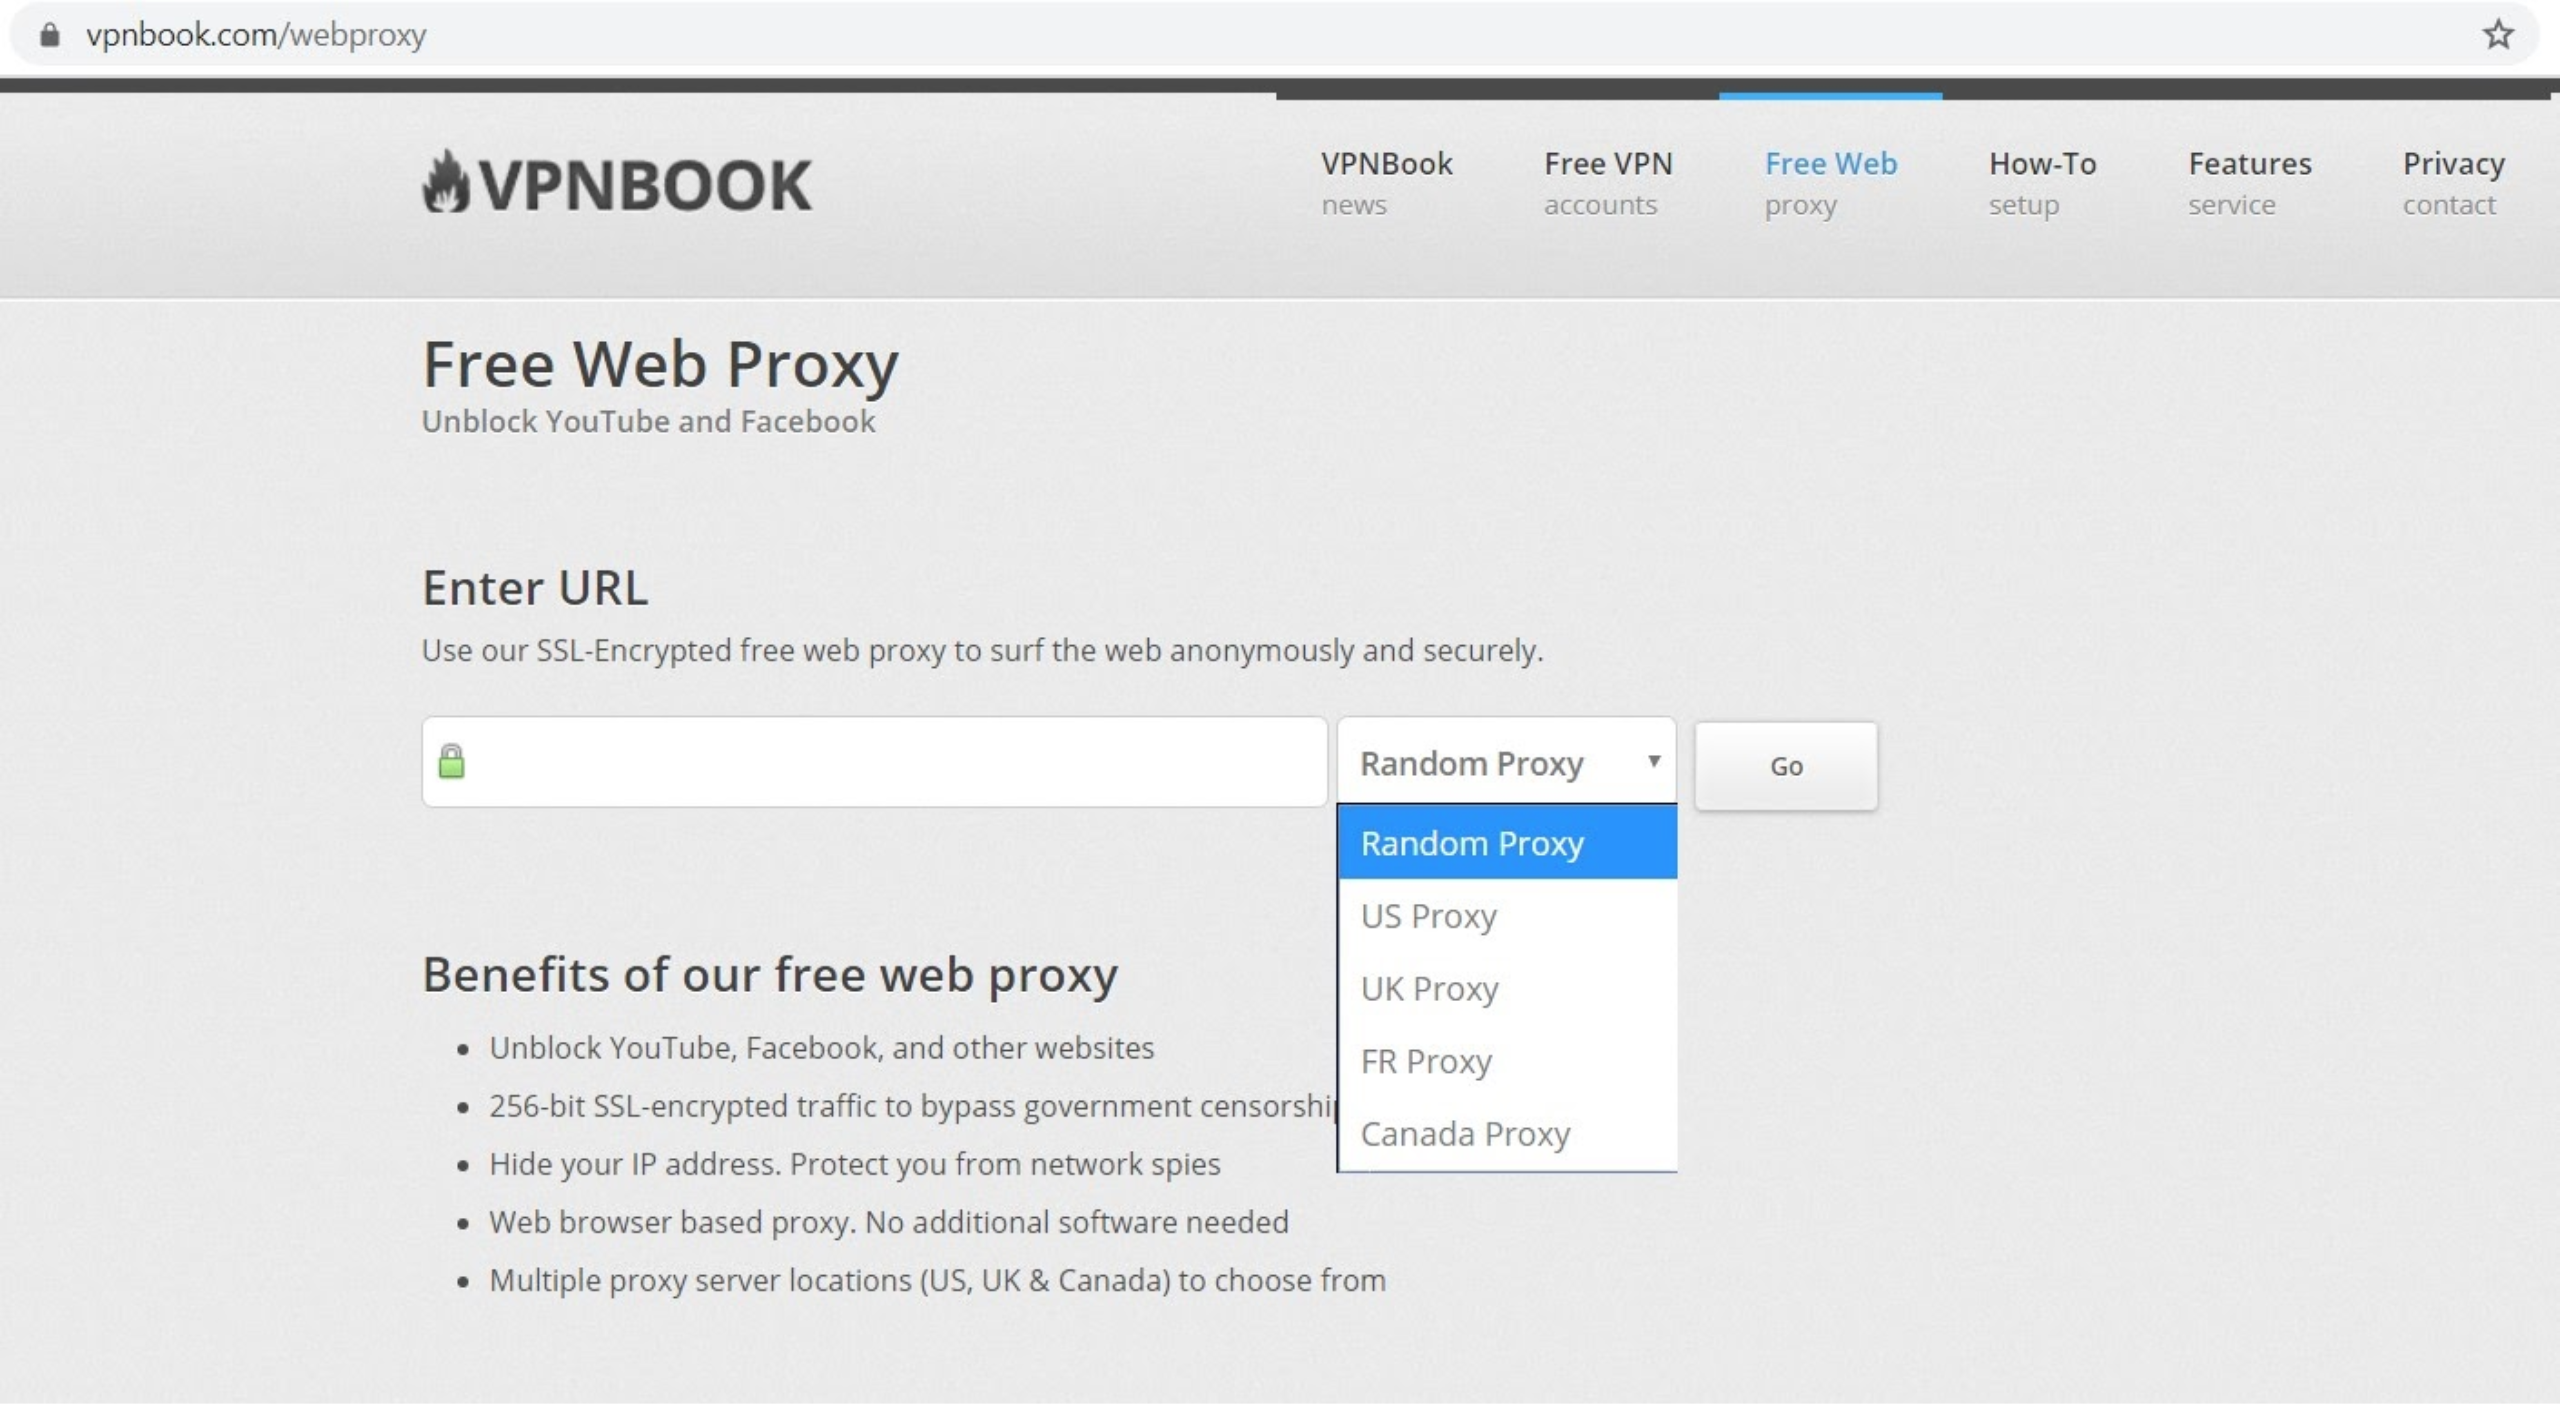 Screenshot der VPNBook-Landingpage